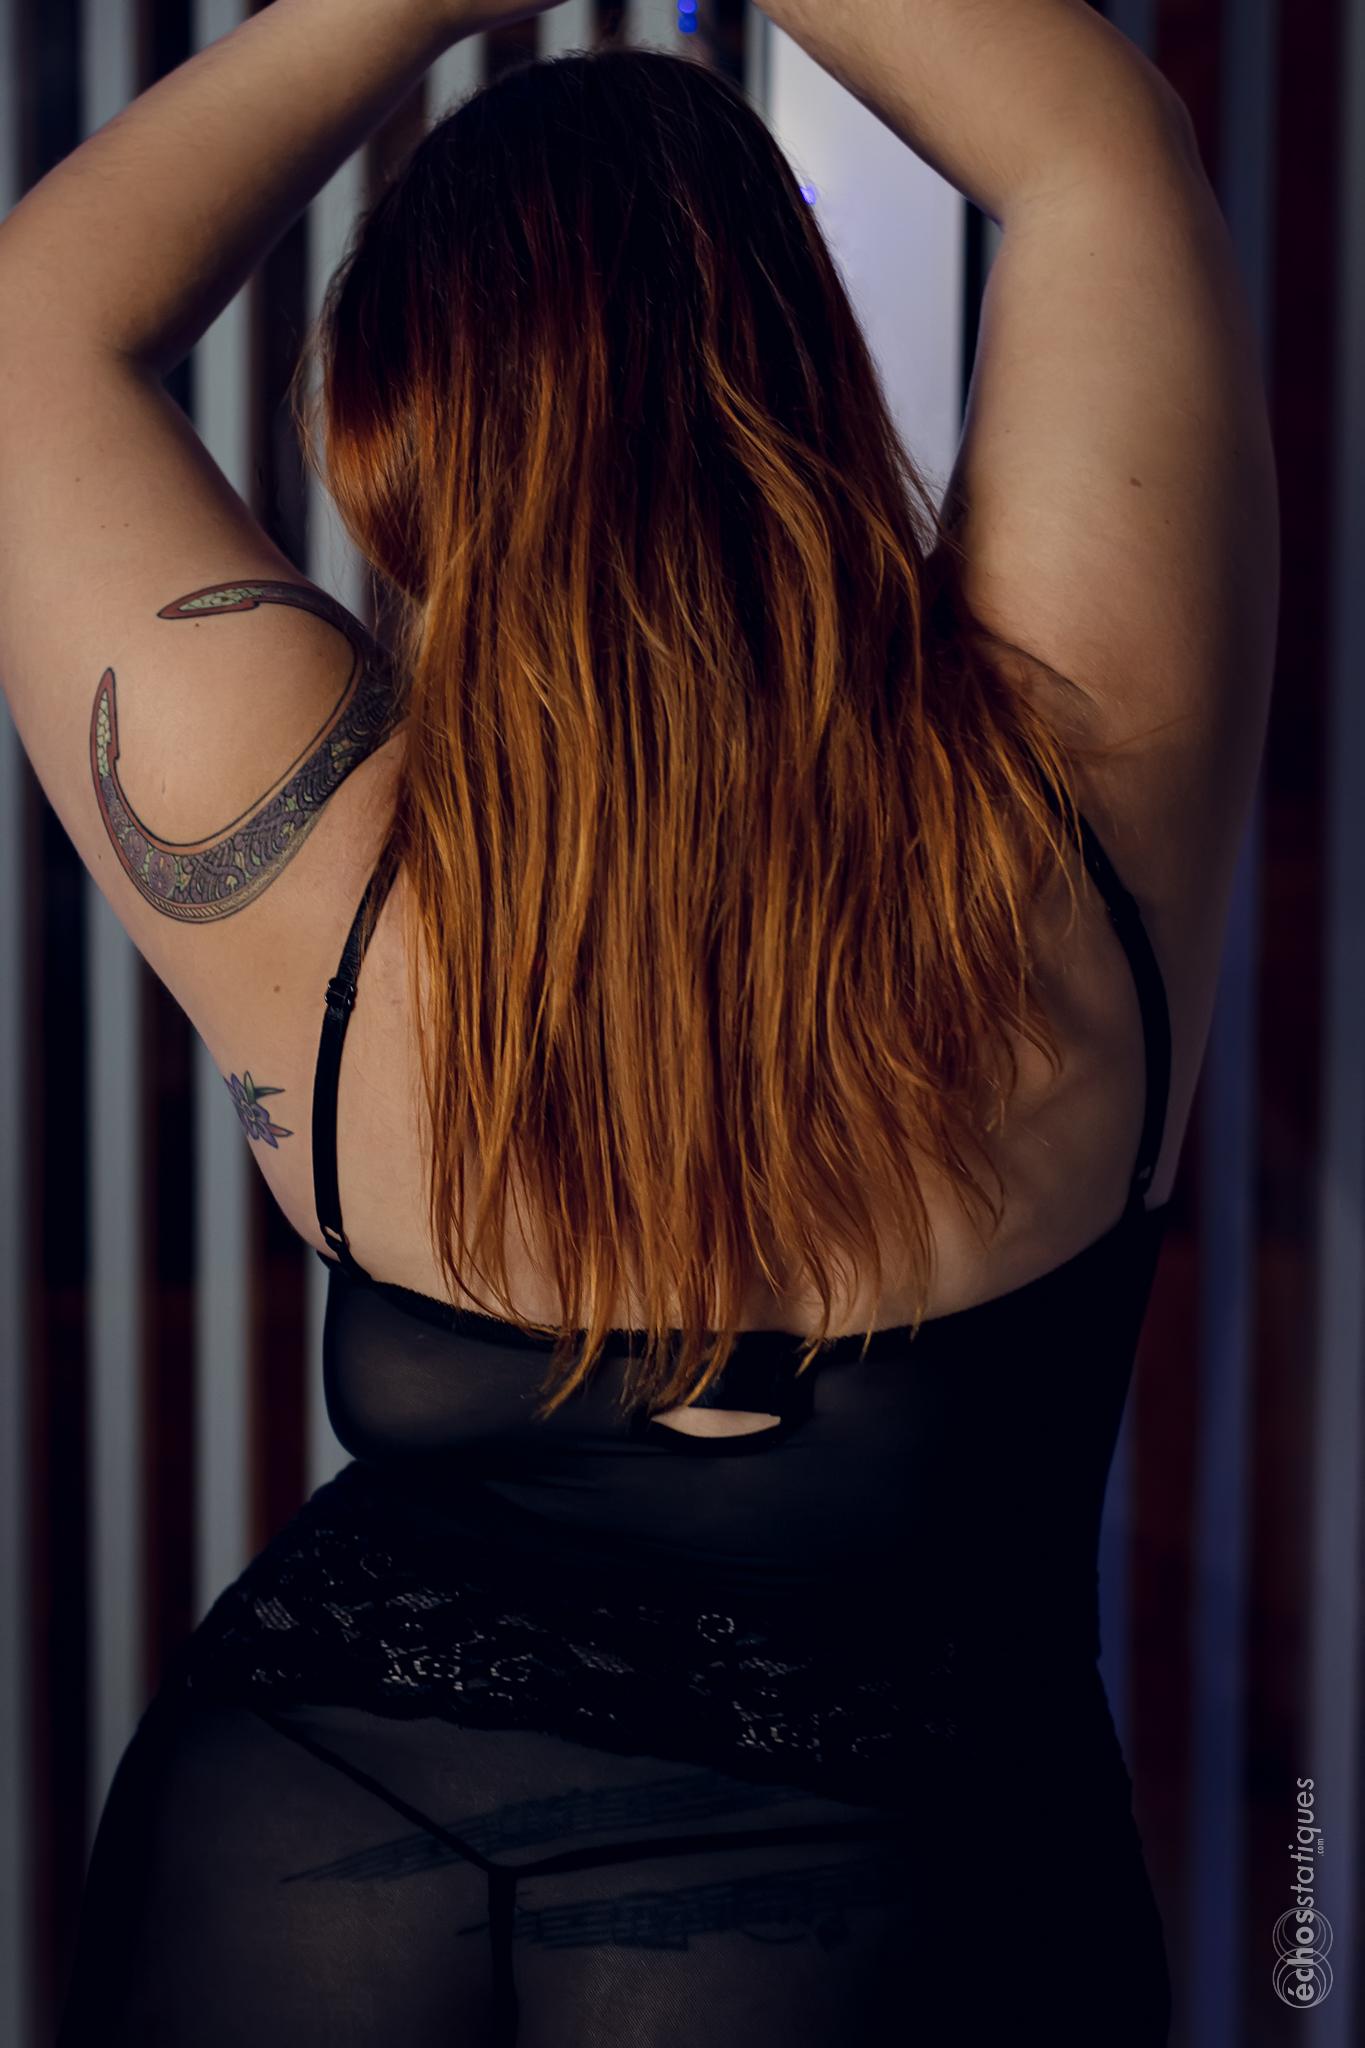 blog-lingerie-grande-taille-nuisette-sexy-passage-du-desir-zoom-dos